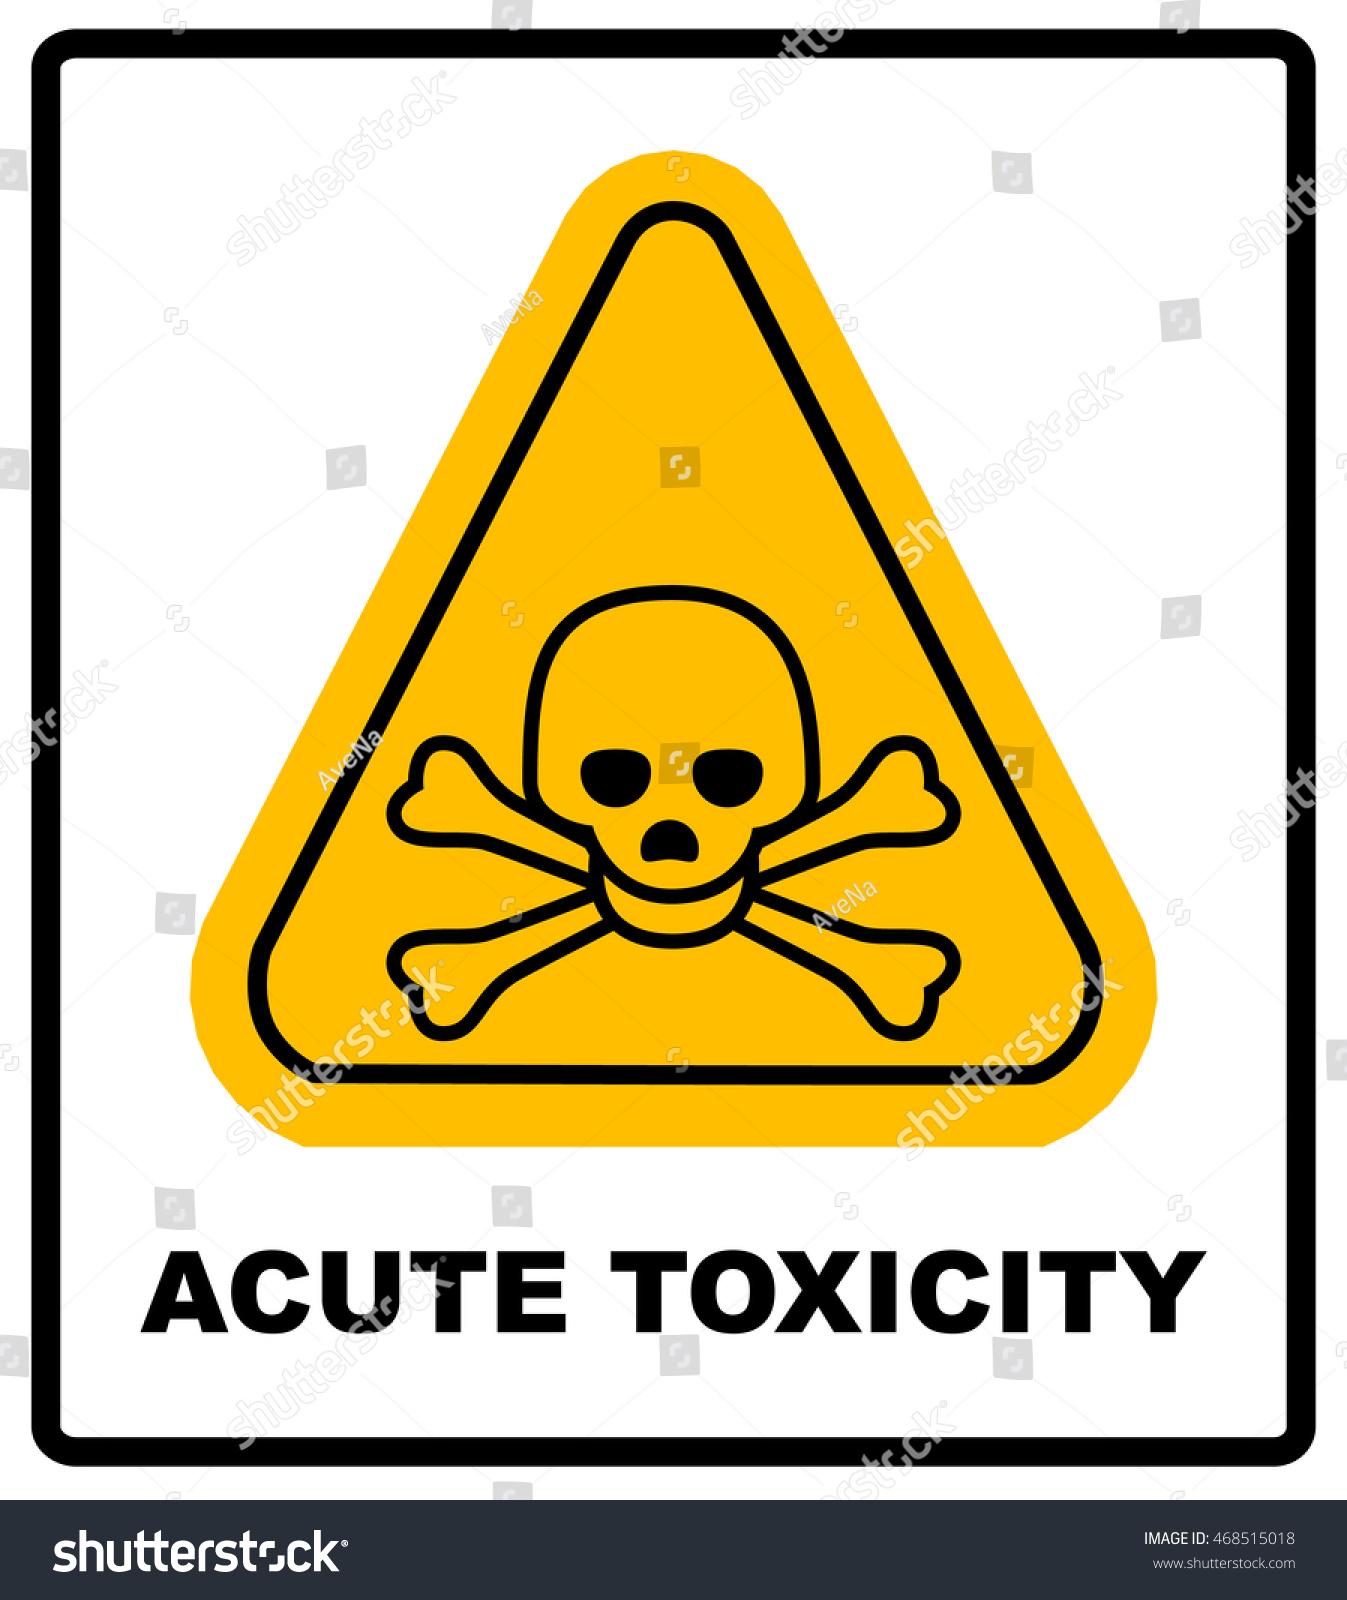 Hazard Pictogram Acute Toxicity Hazard Symbol Vector Banner For